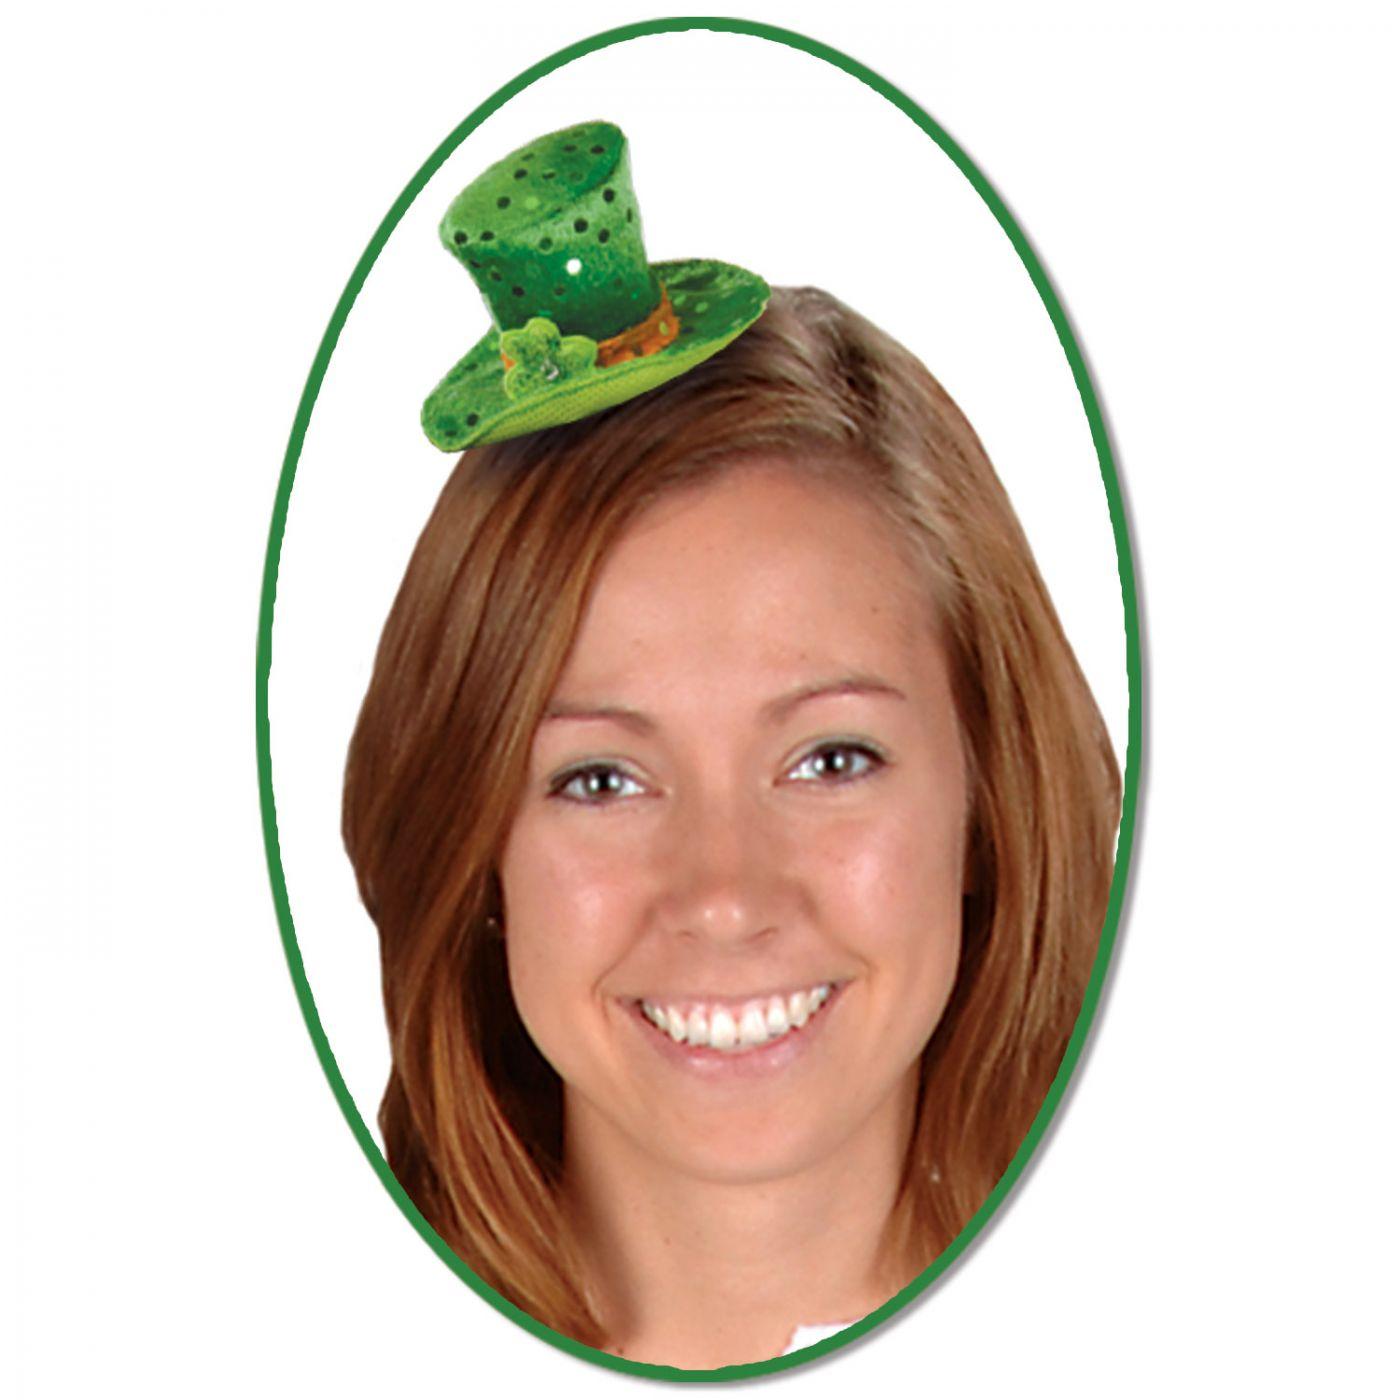 Leprechaun Hat Hair Clip image